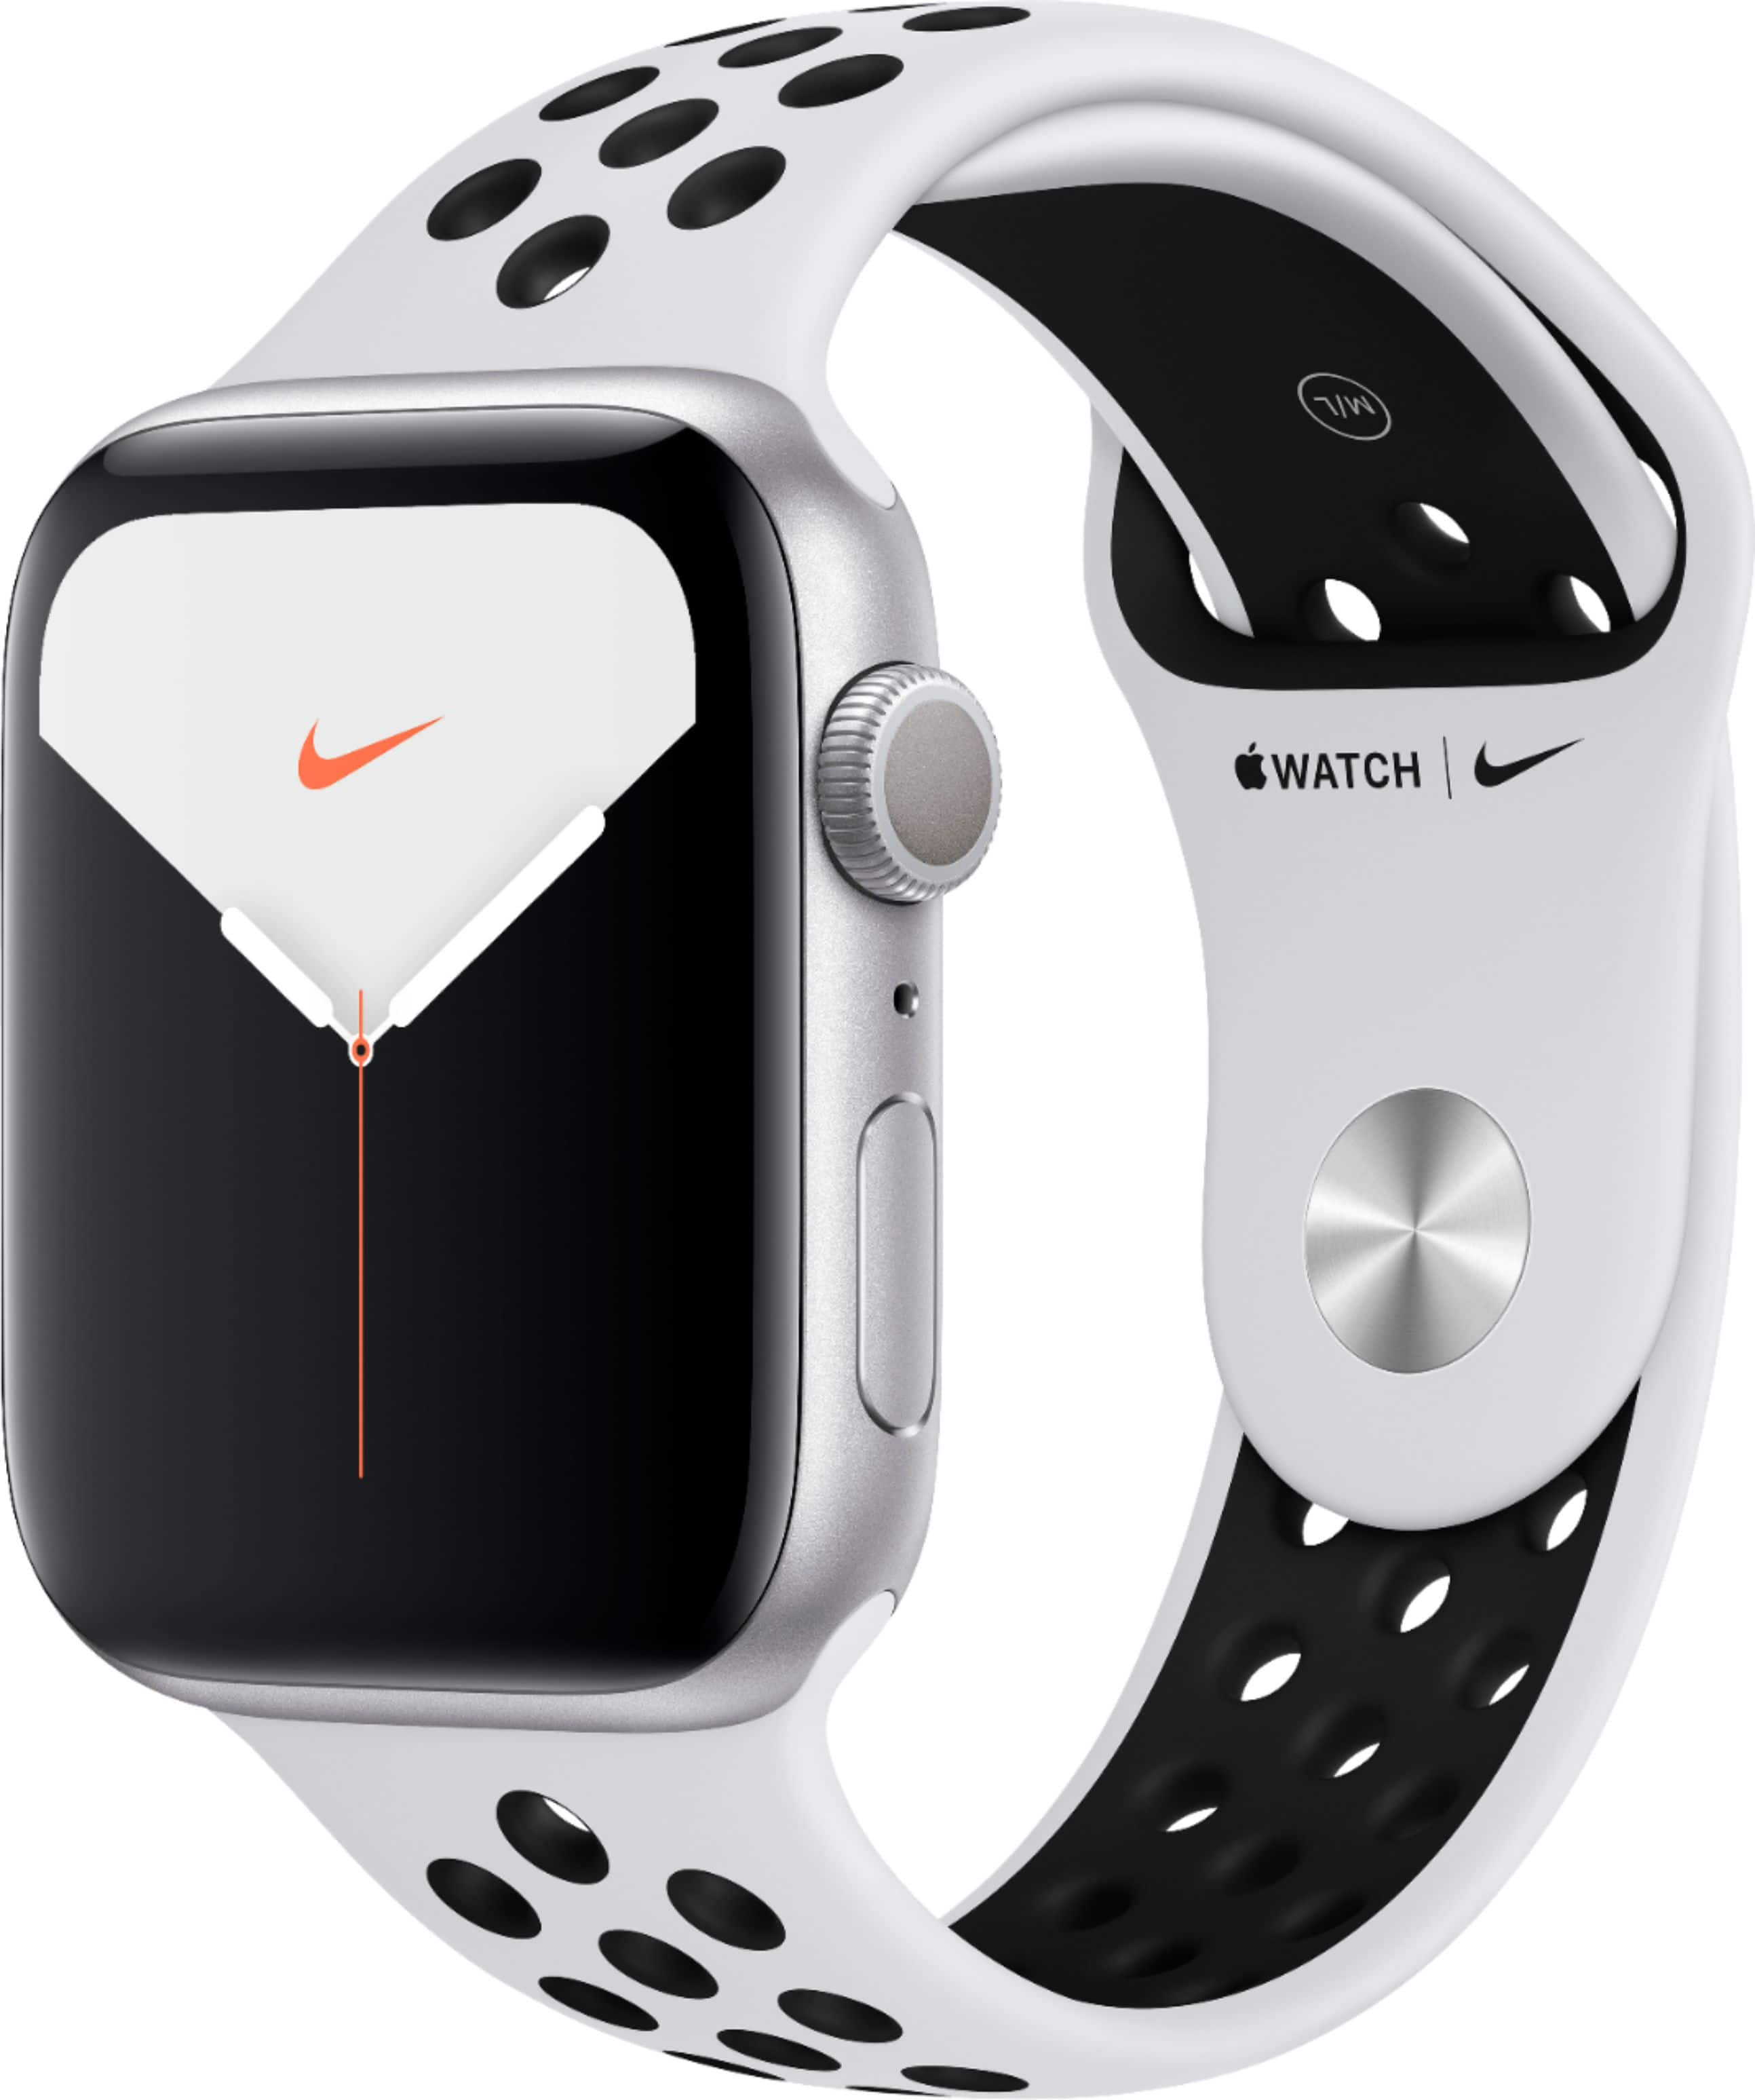 Apple Watch Nike Series 5 Watch 44mm (Silver Aluminum) - $299.00